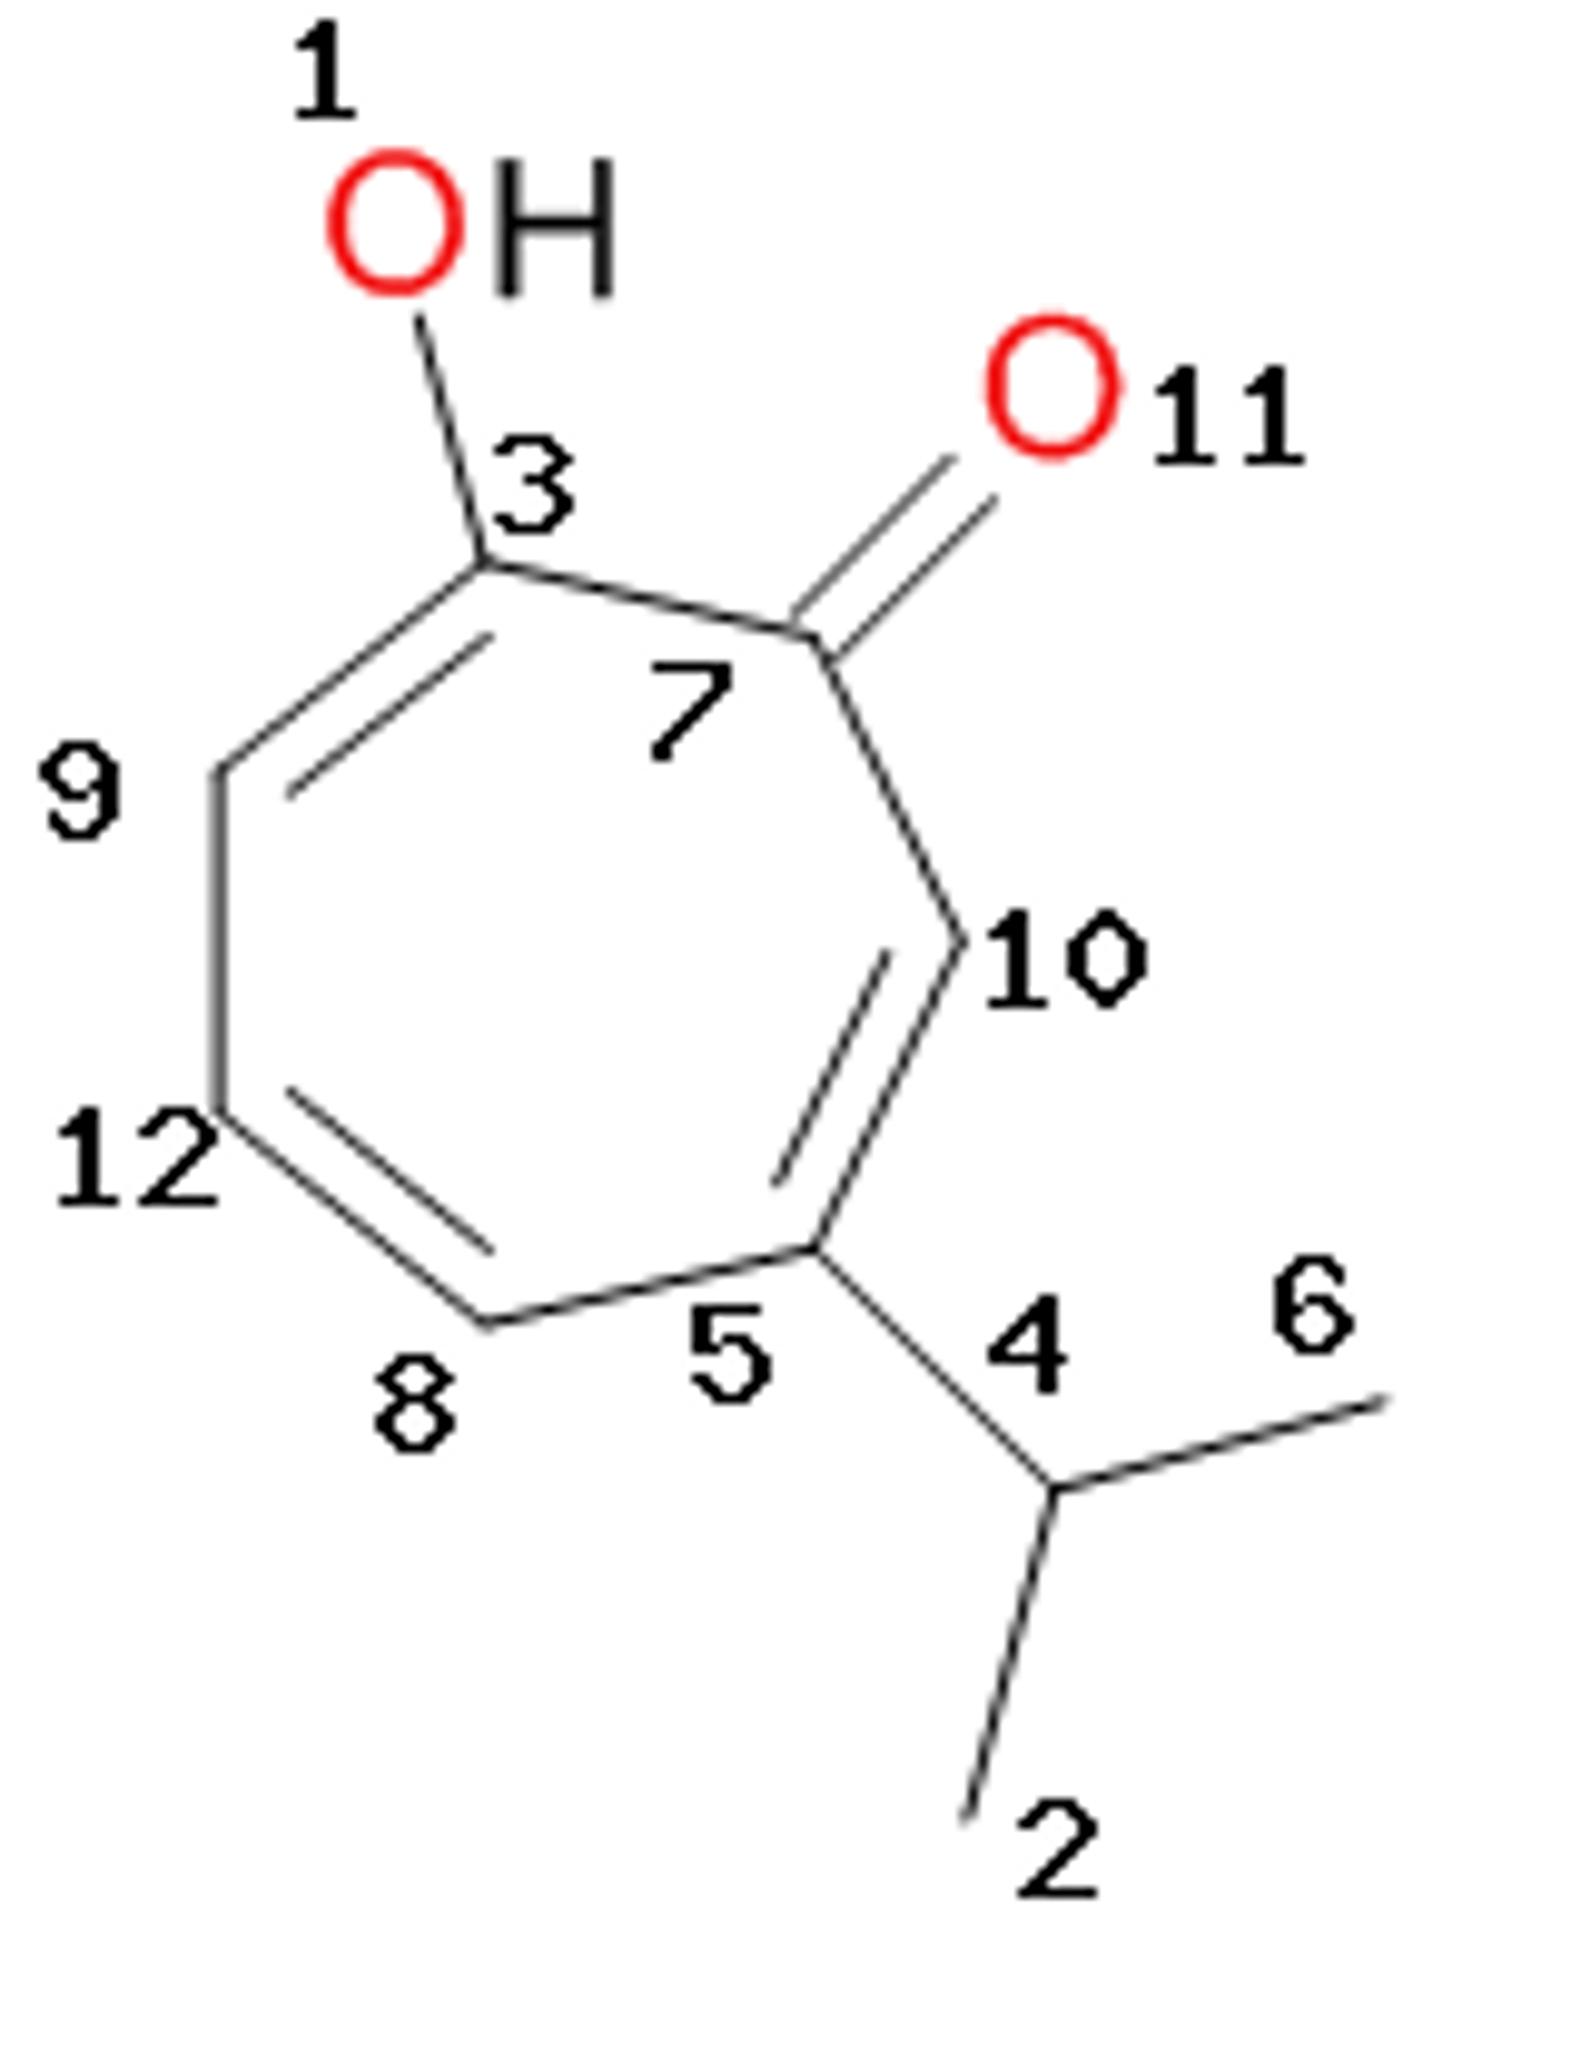 molecular orbital diagram of oh glock 21 solved the structure hinokitiol is represent